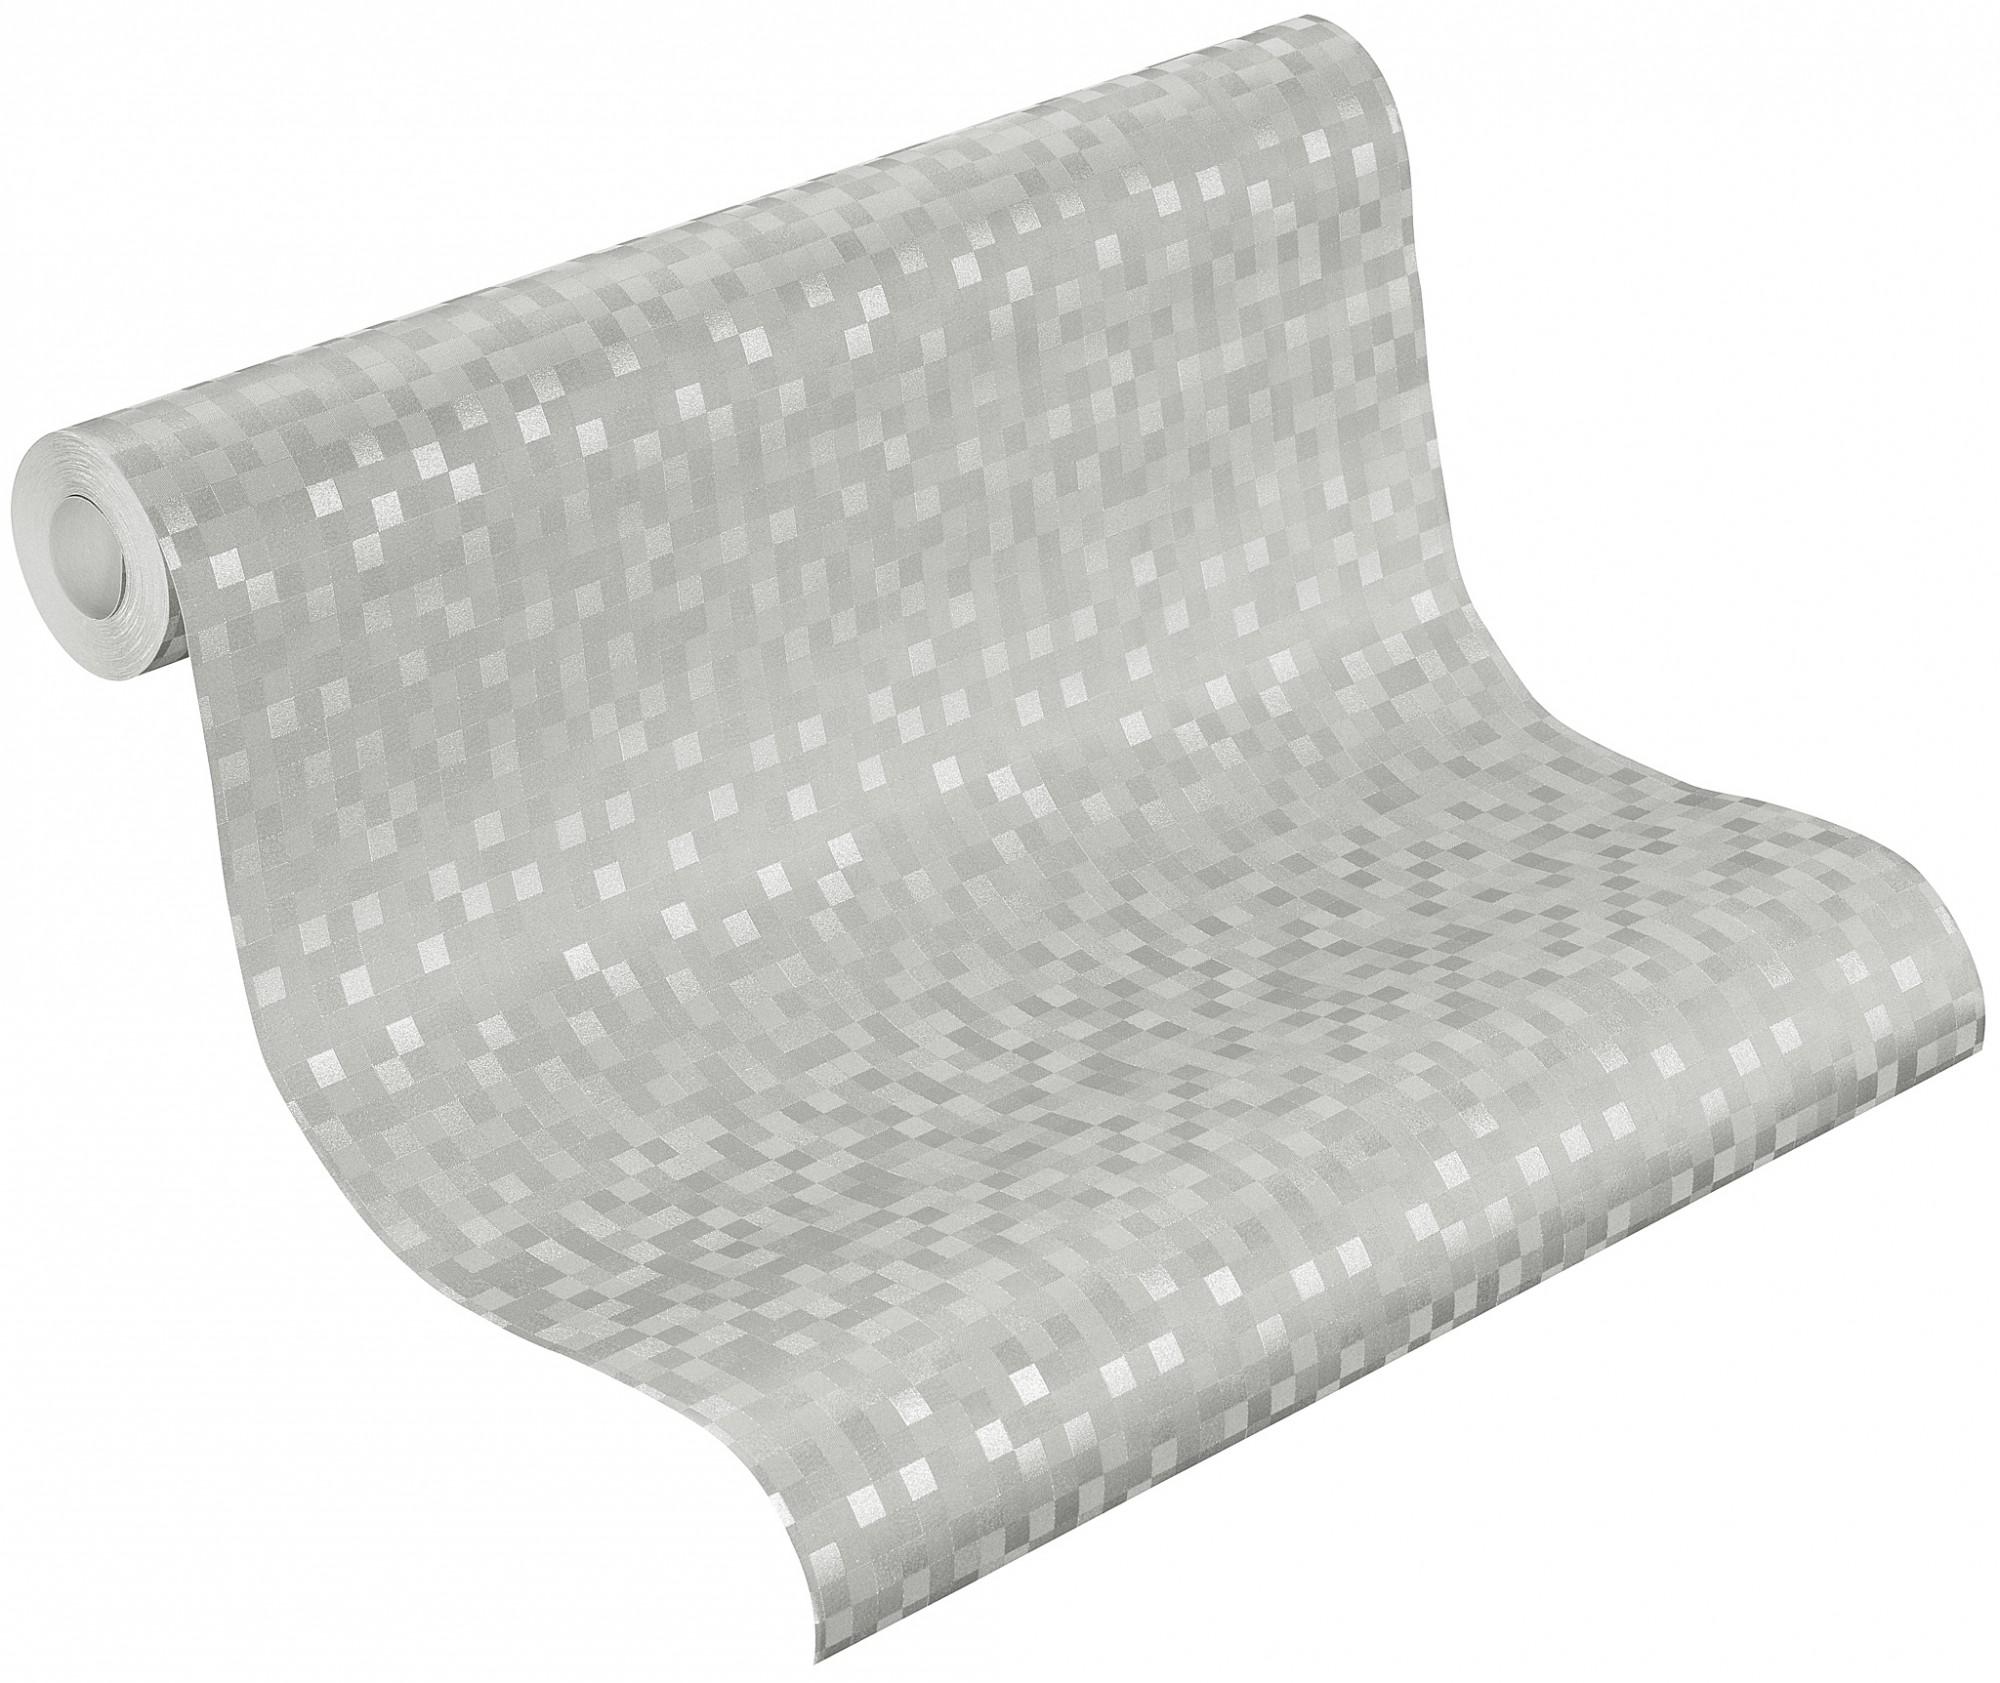 tapete kariert hellgrau silber vliestapete rasch shiny. Black Bedroom Furniture Sets. Home Design Ideas